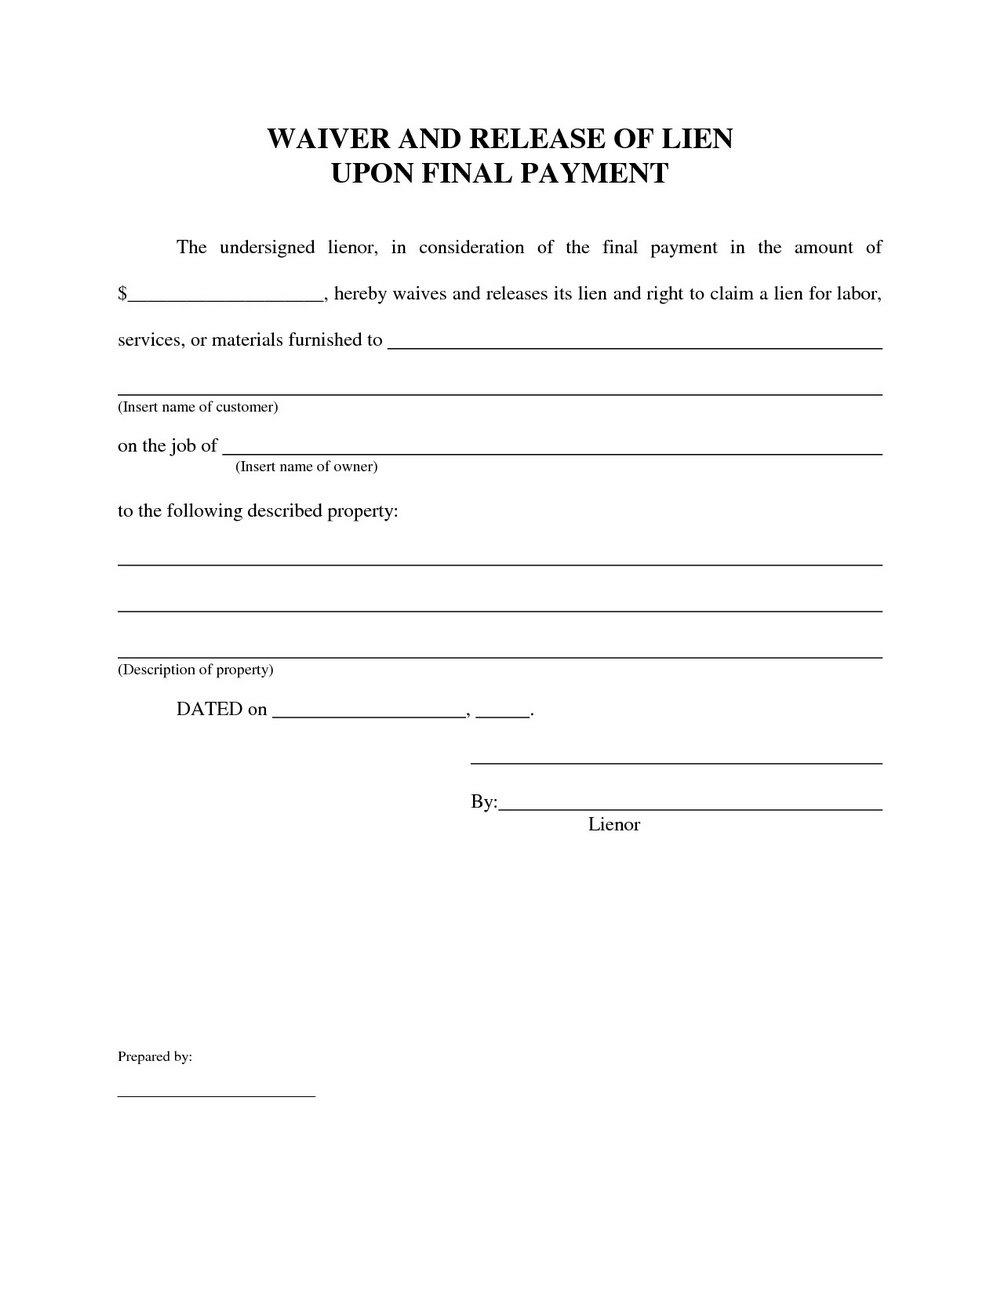 Lien Release Form Oklahoma